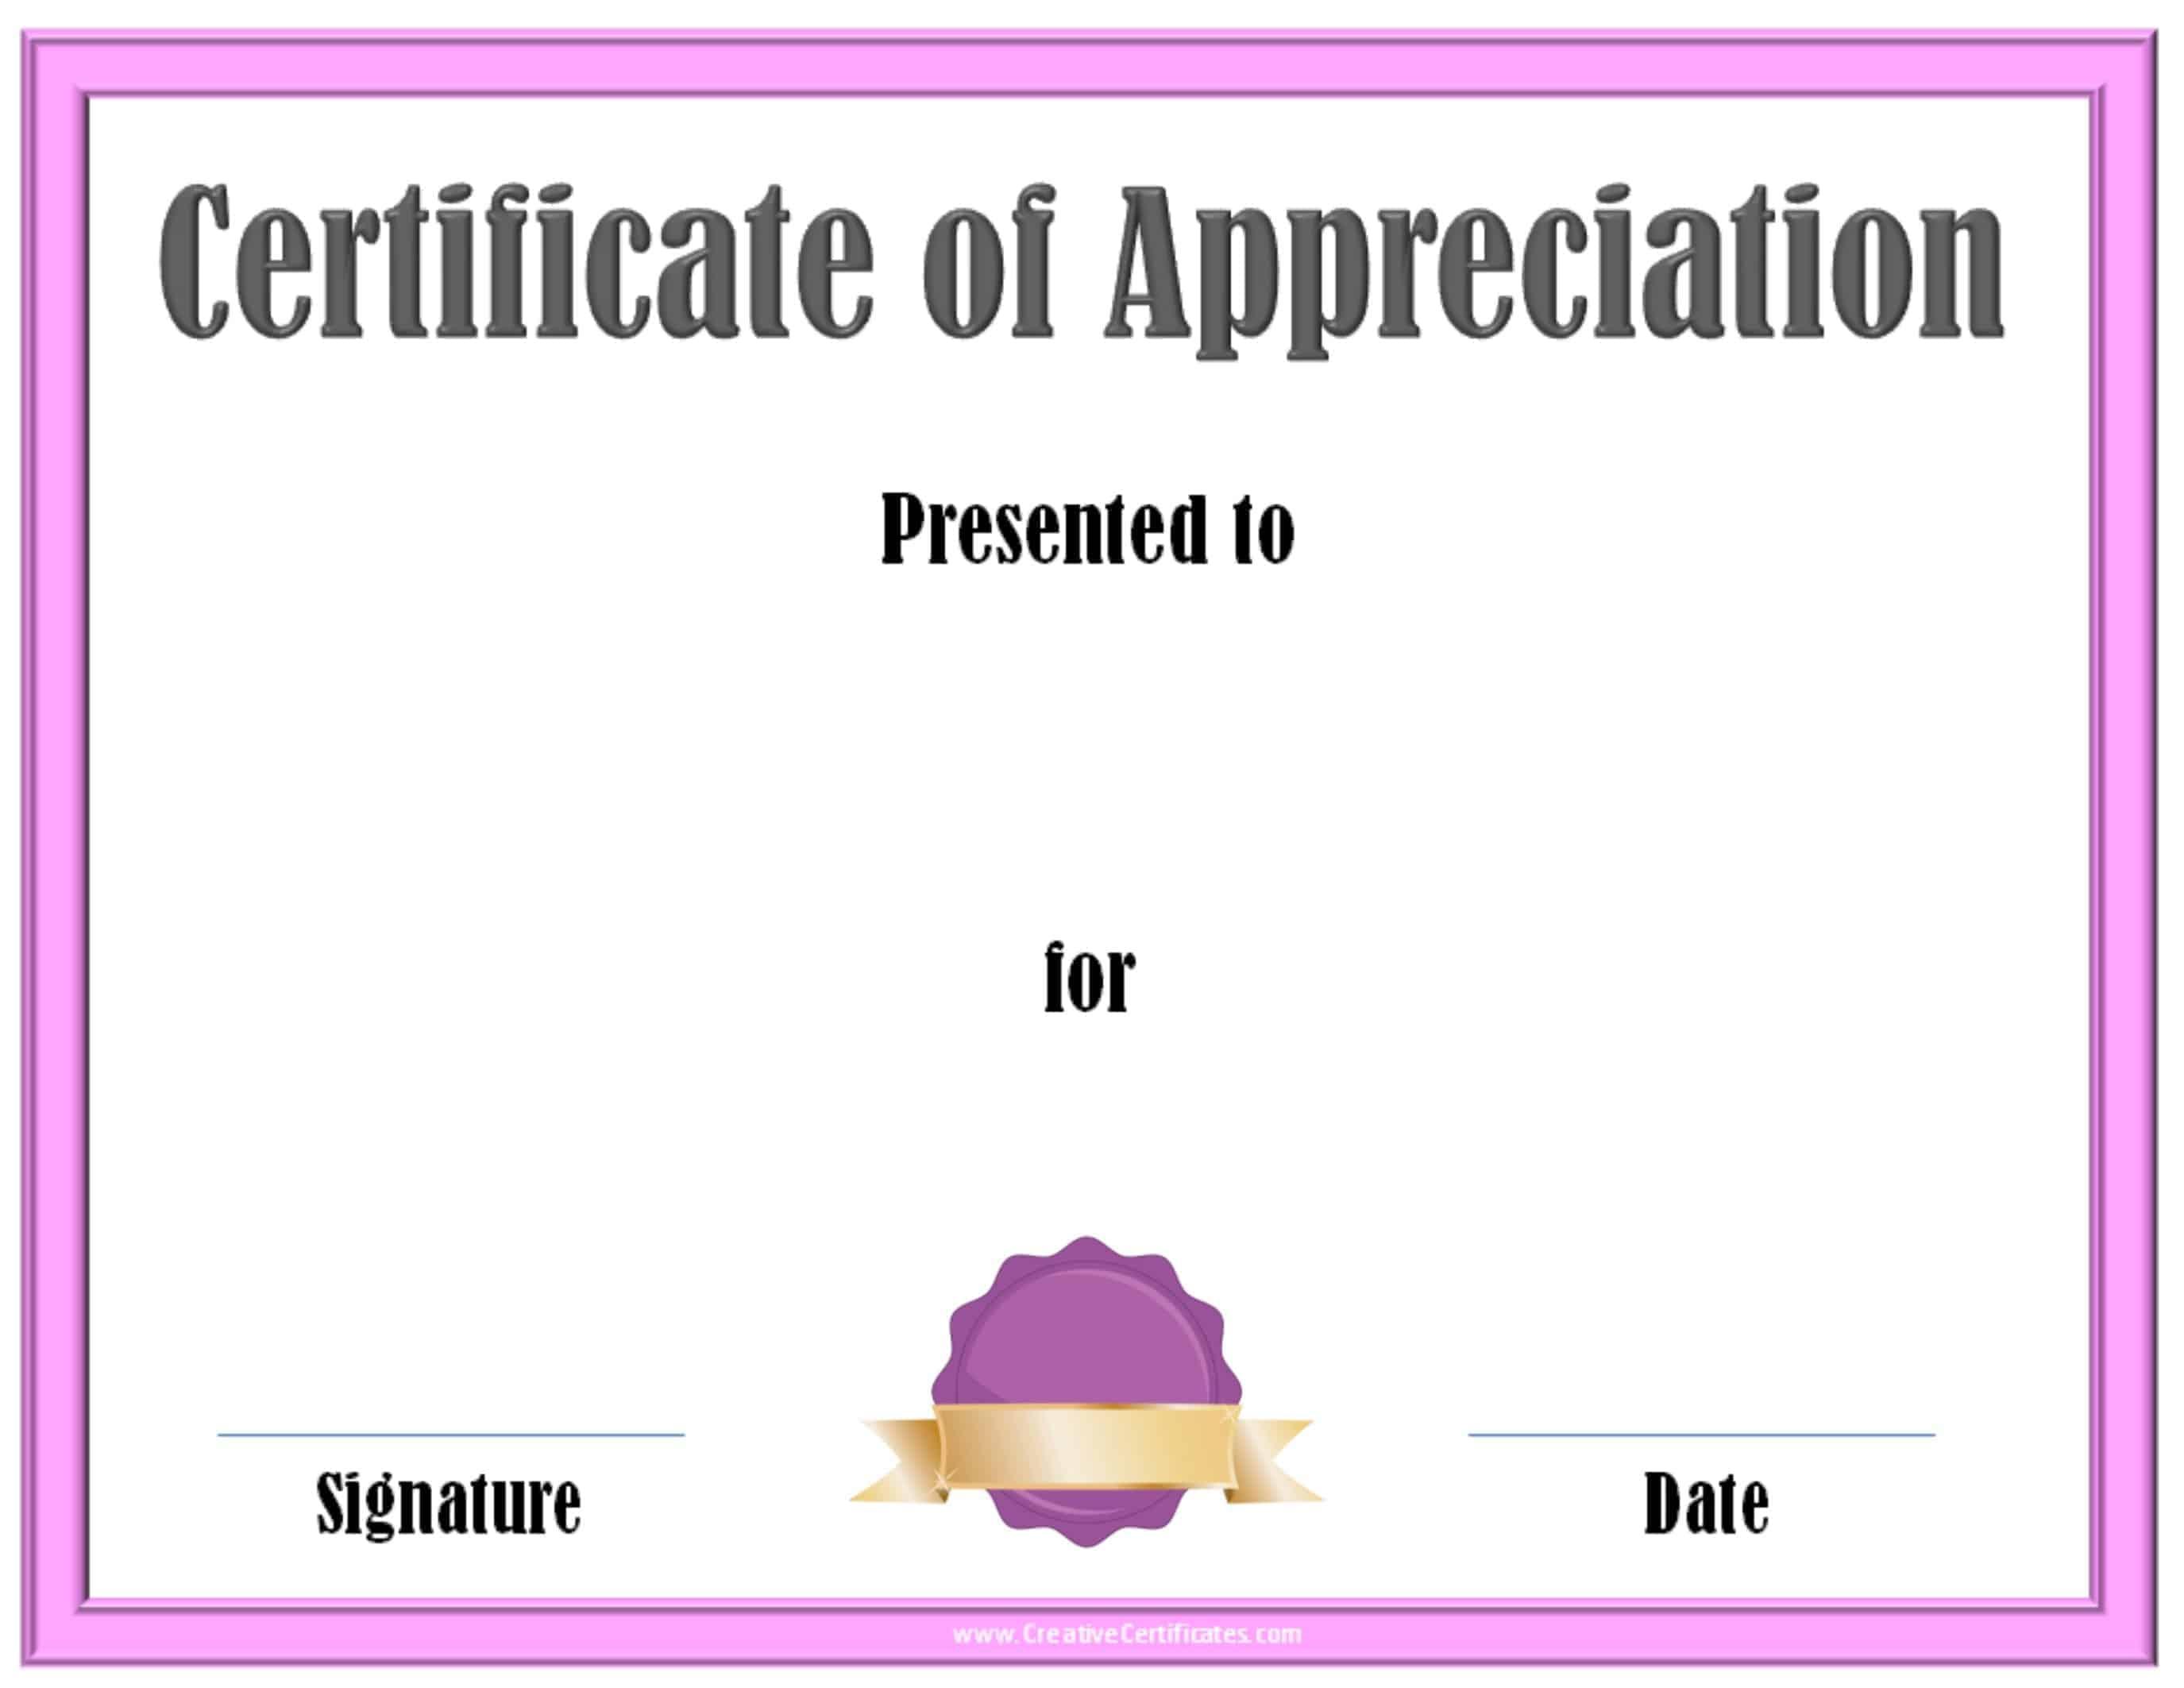 Appreciation Certificates Templates free printable certificates – Certificate of Appreciation Templates Free Download